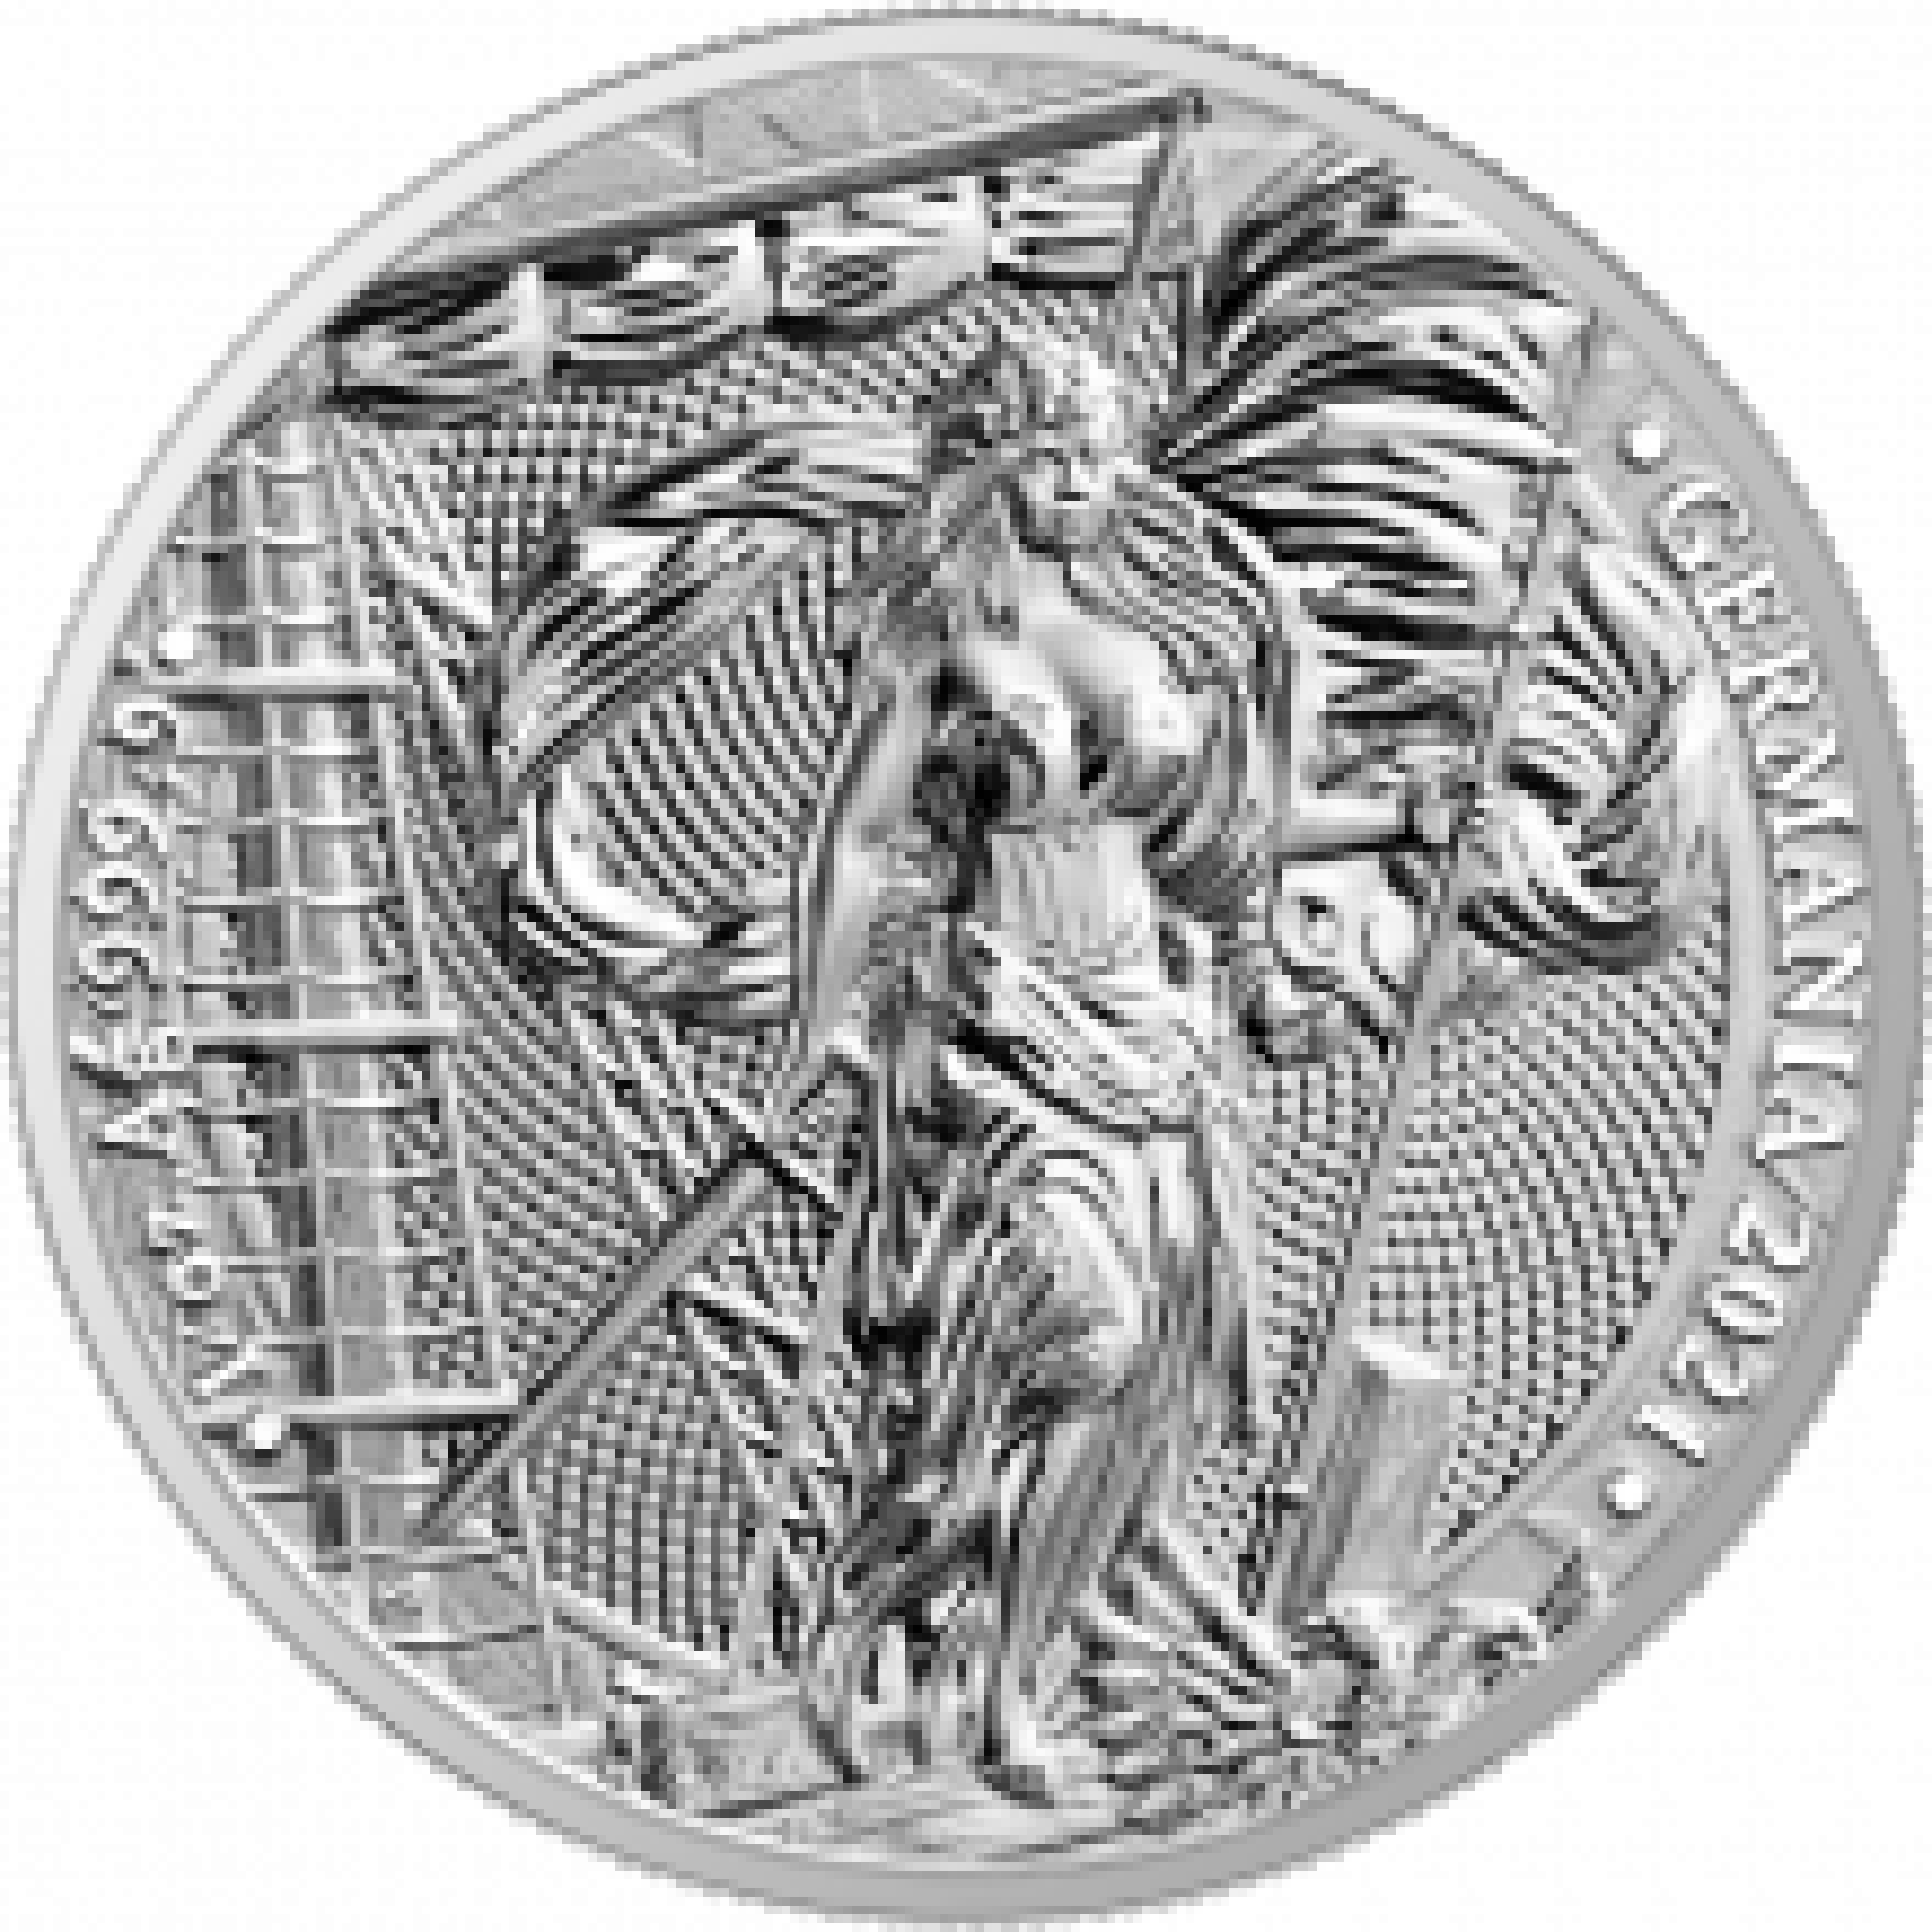 1 Troy ounce silver coin Germania 2021